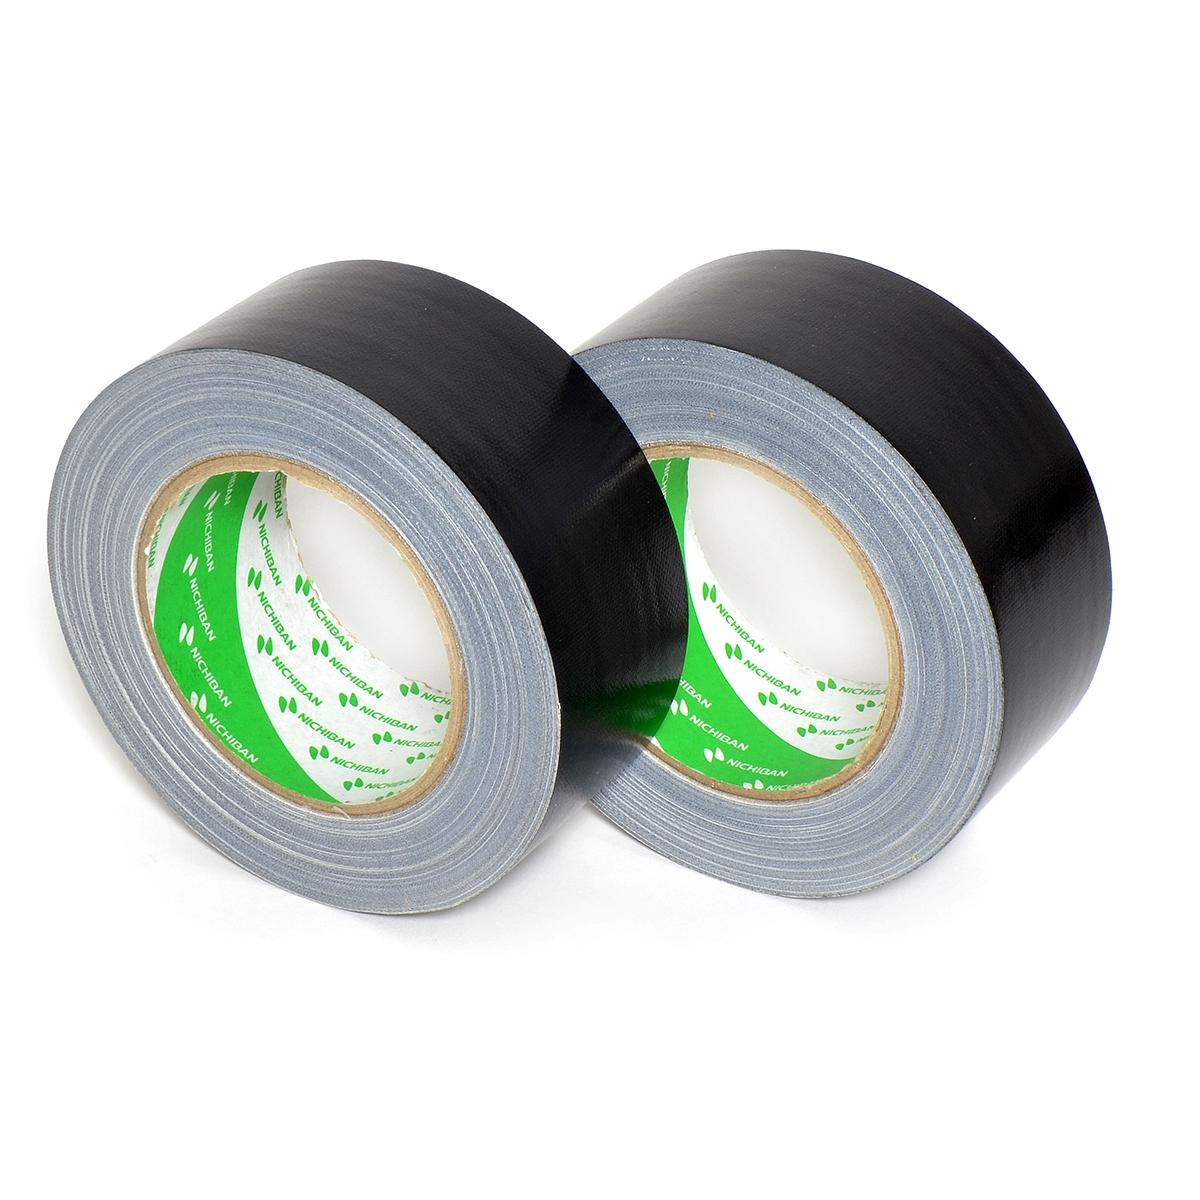 Nichiban - Duct tape - 50mm x 25m - Zwart - 2 pack